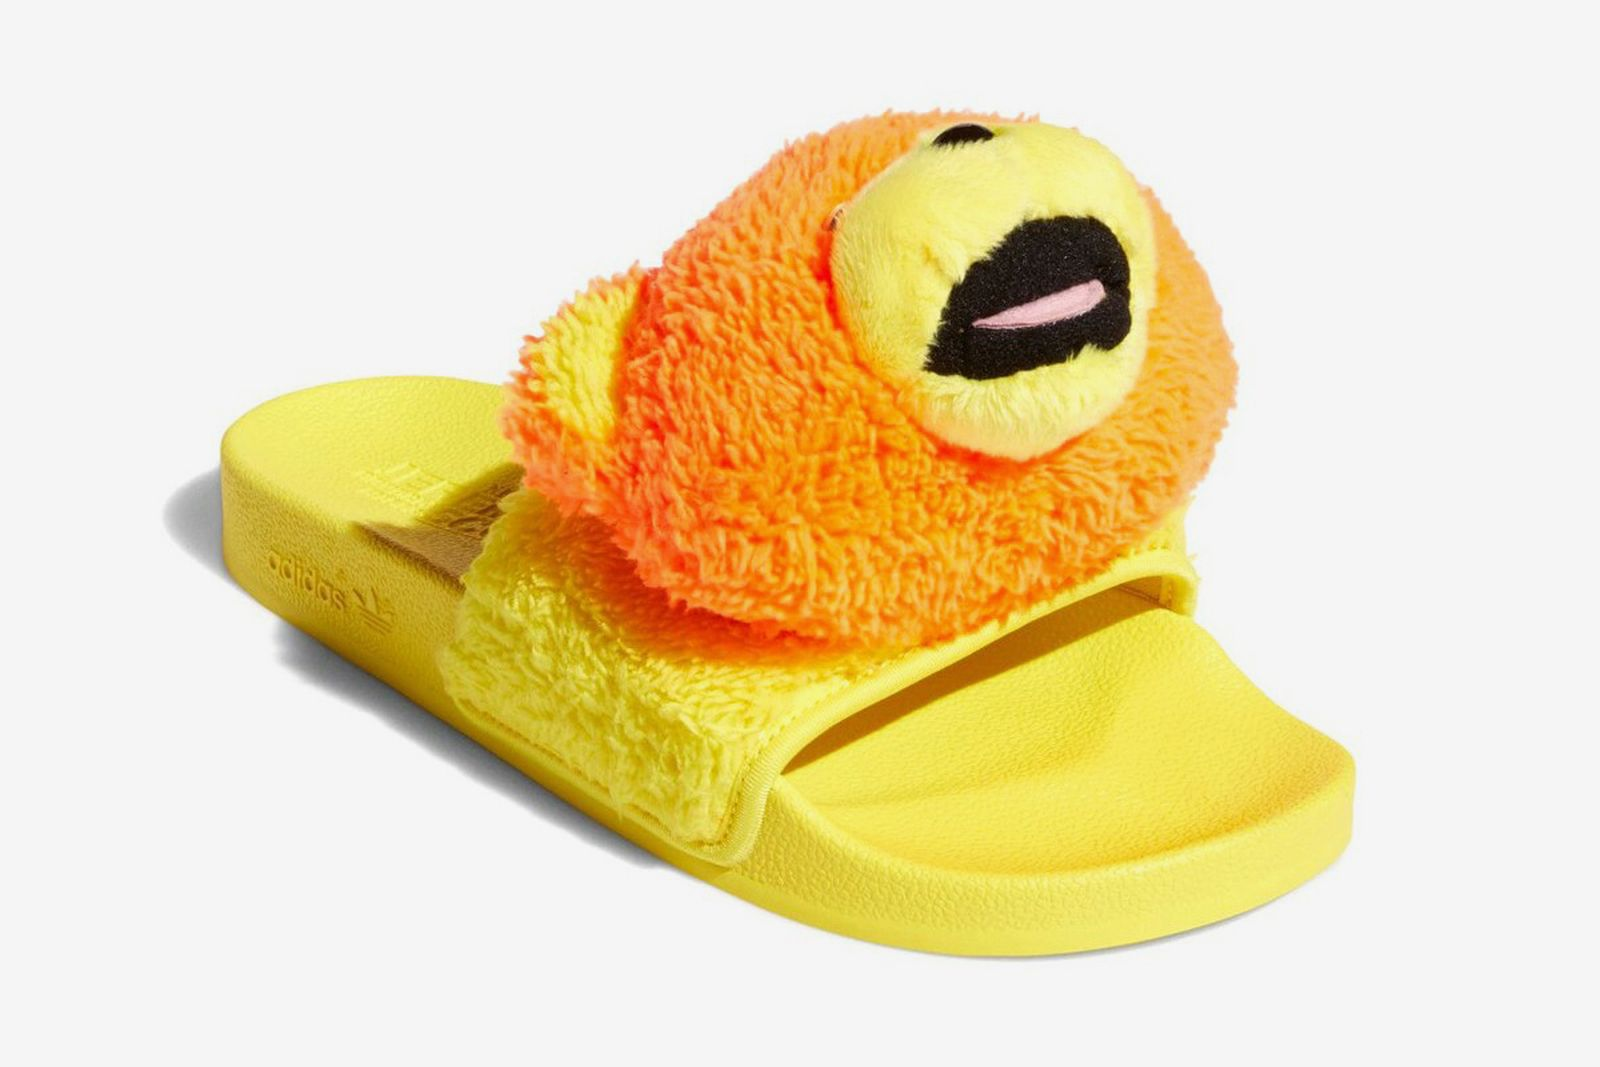 jeremy-scott-adidas-adilette-slides-js-bear-release-date-price-03